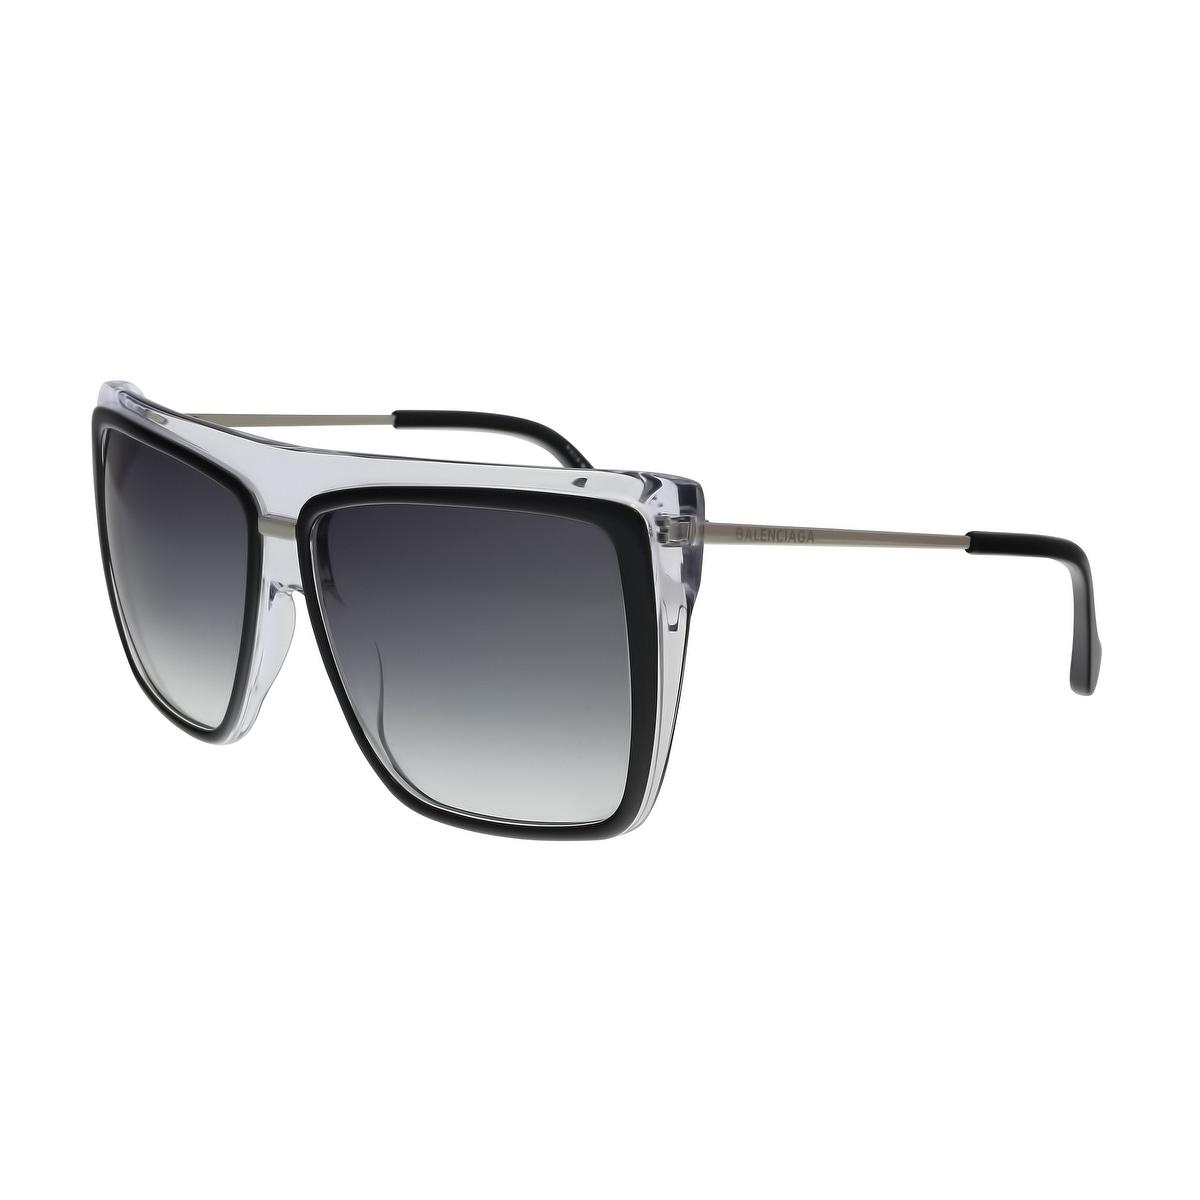 7f5bd063d8a Women s Sunglasses